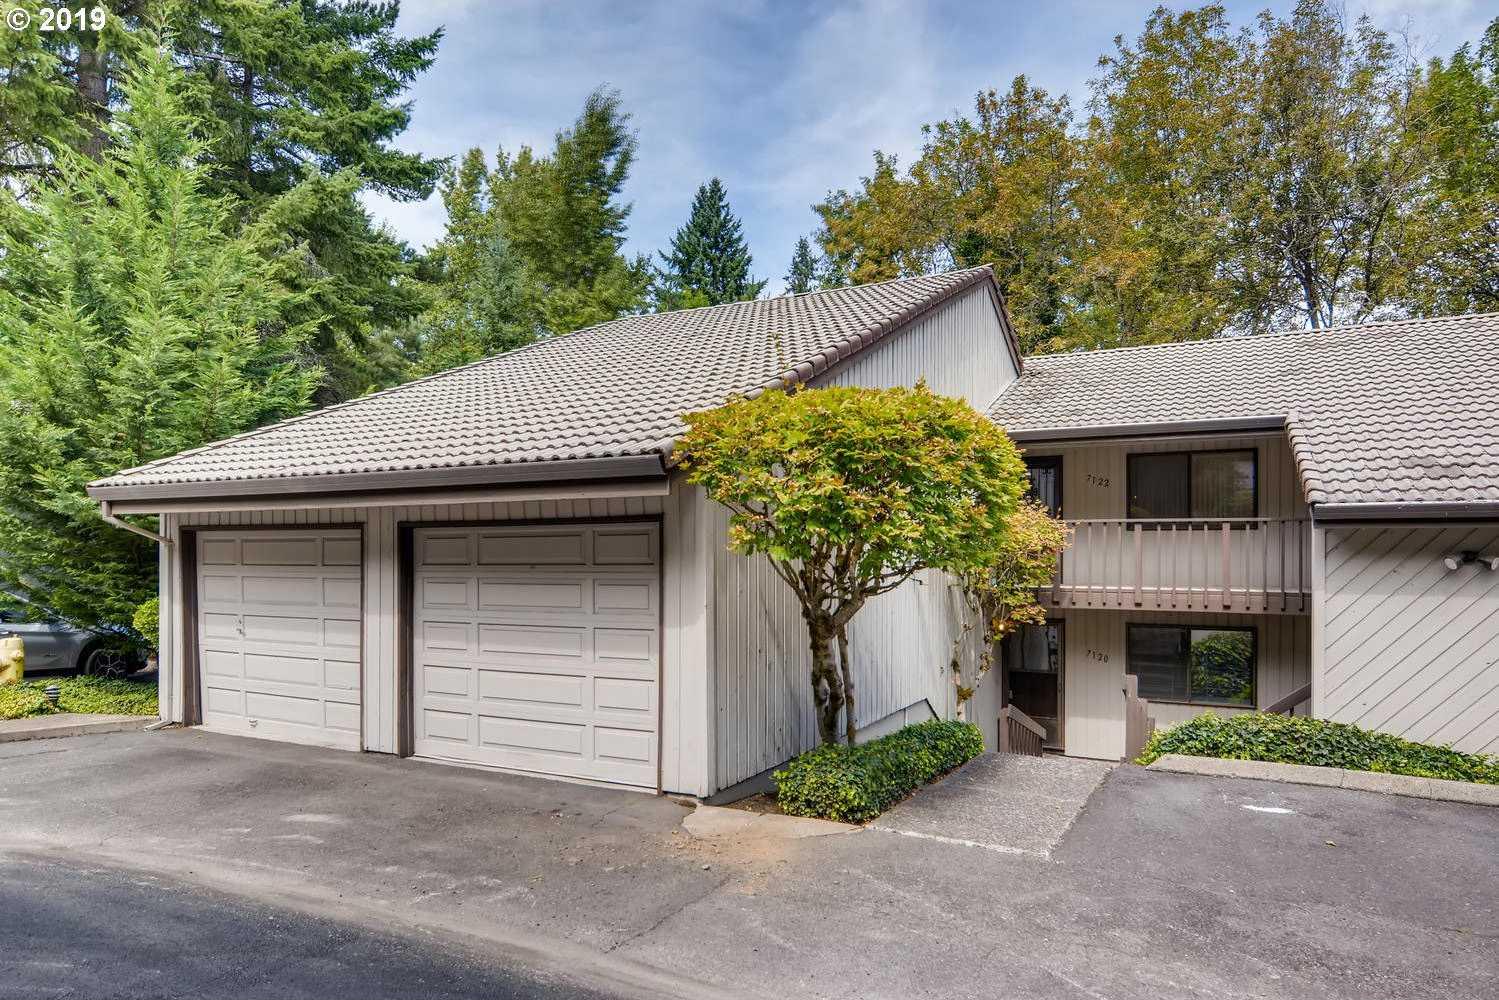 $239,900 - 2Br/2Ba -  for Sale in Knollhurst Condominiums, Beaverton